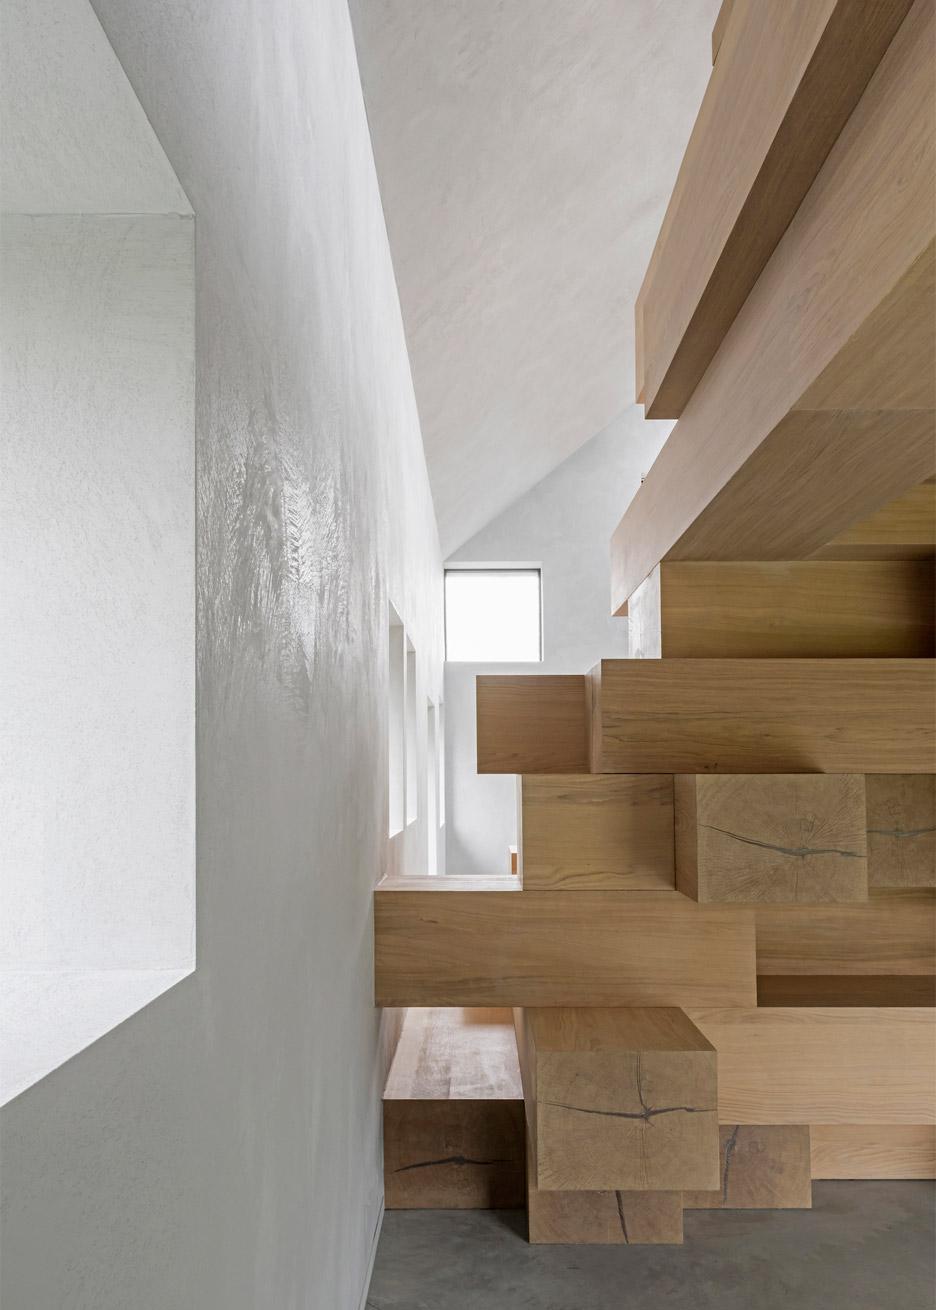 architecture_wood_office_design_studia_interiors_osnovadesign_osnova_poltava_12